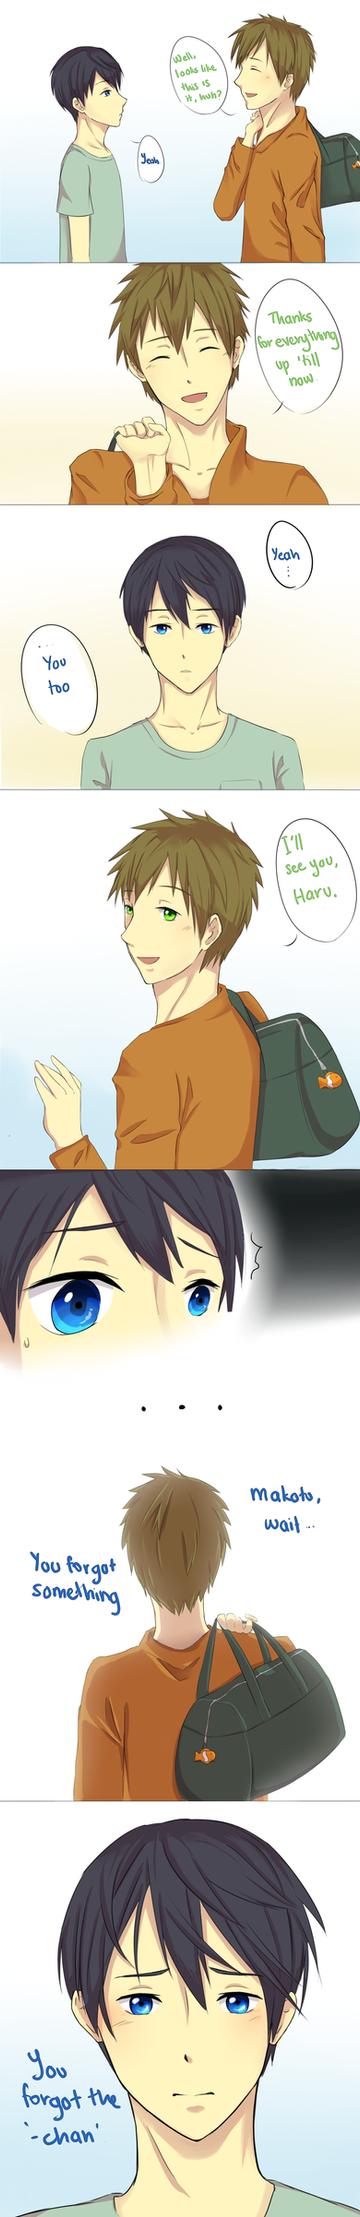 [MakoHaru] You Forgot The Chan by YerBestFriend99